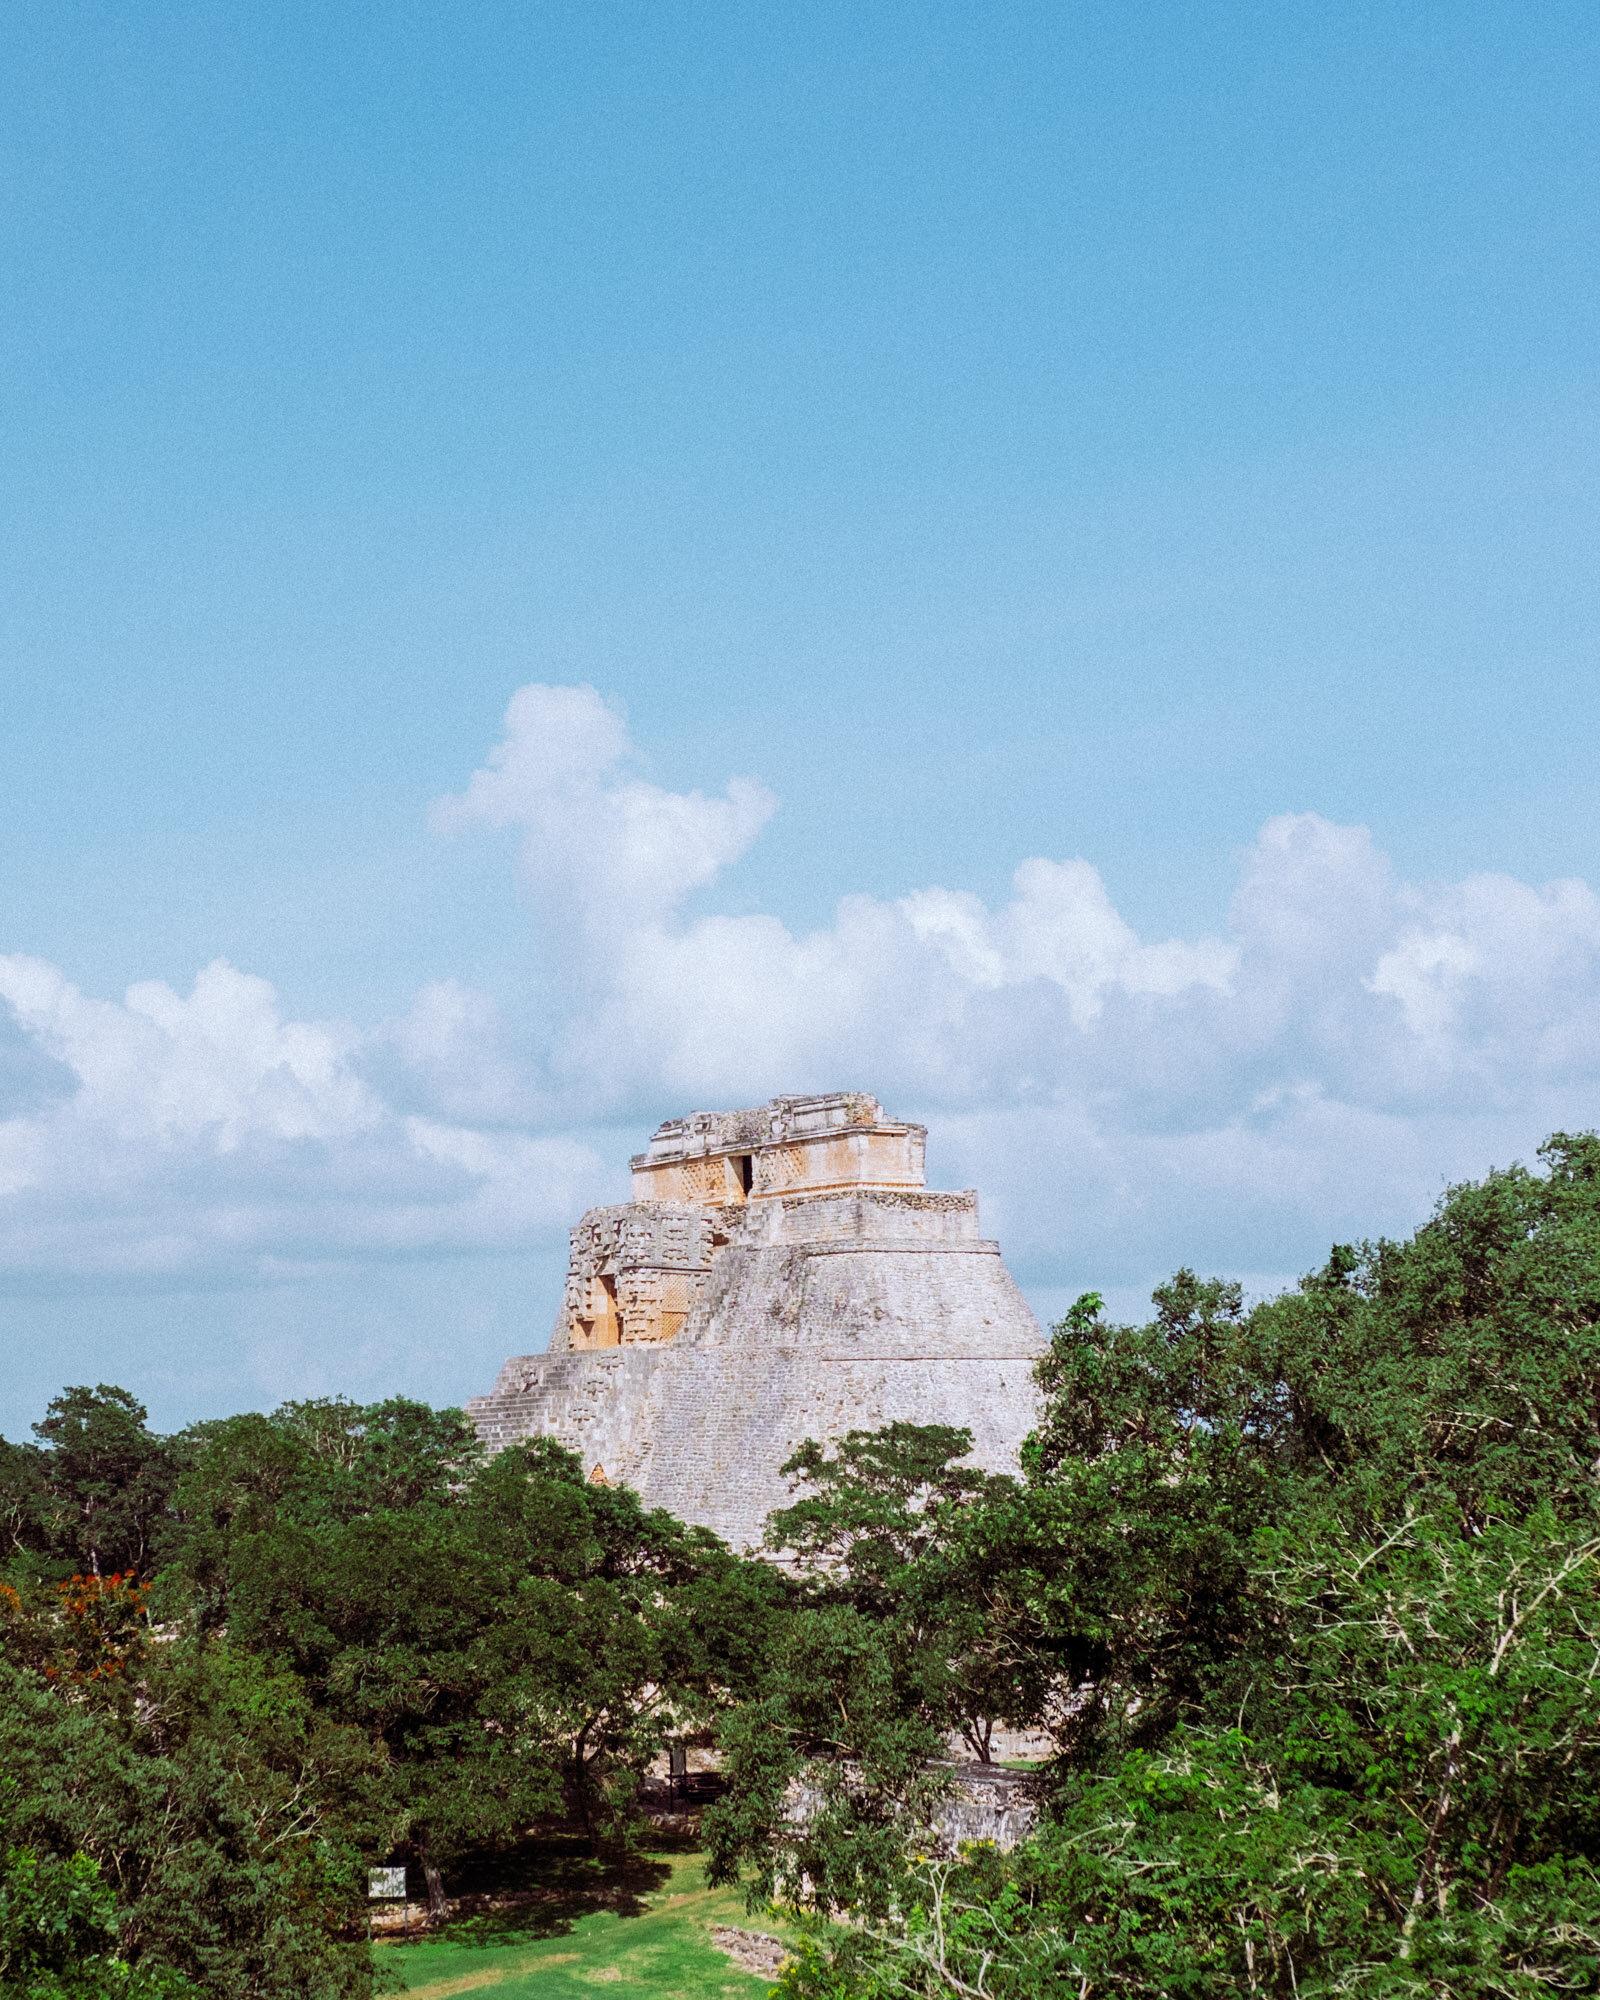 Rachel Off Duty: The Pyramid of the Magician, Uxmal, Mexico